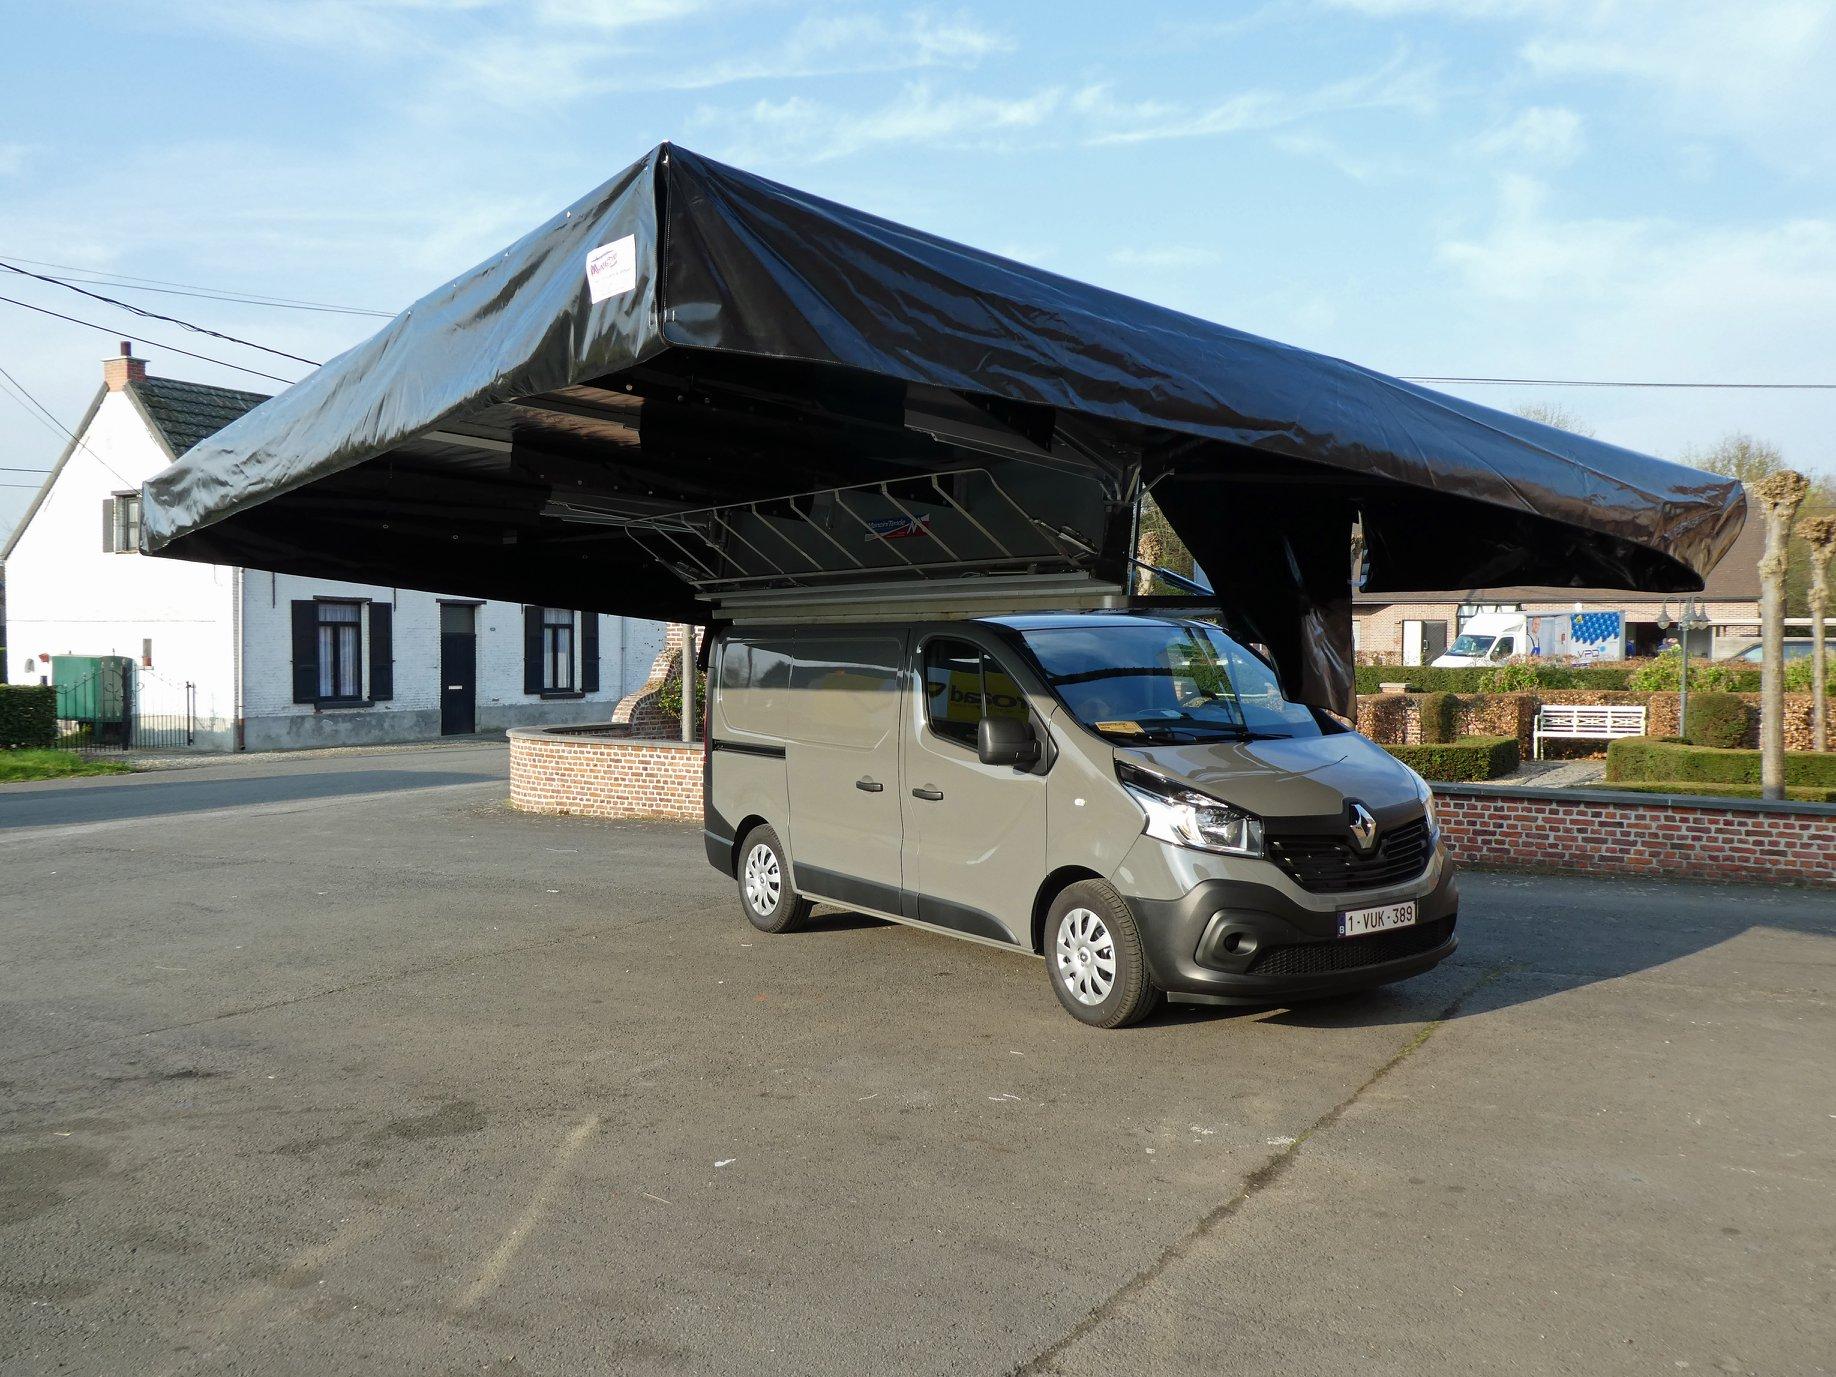 Renault-Traffic-lengte-geopend--8m--breedte-geopend--4.8m2